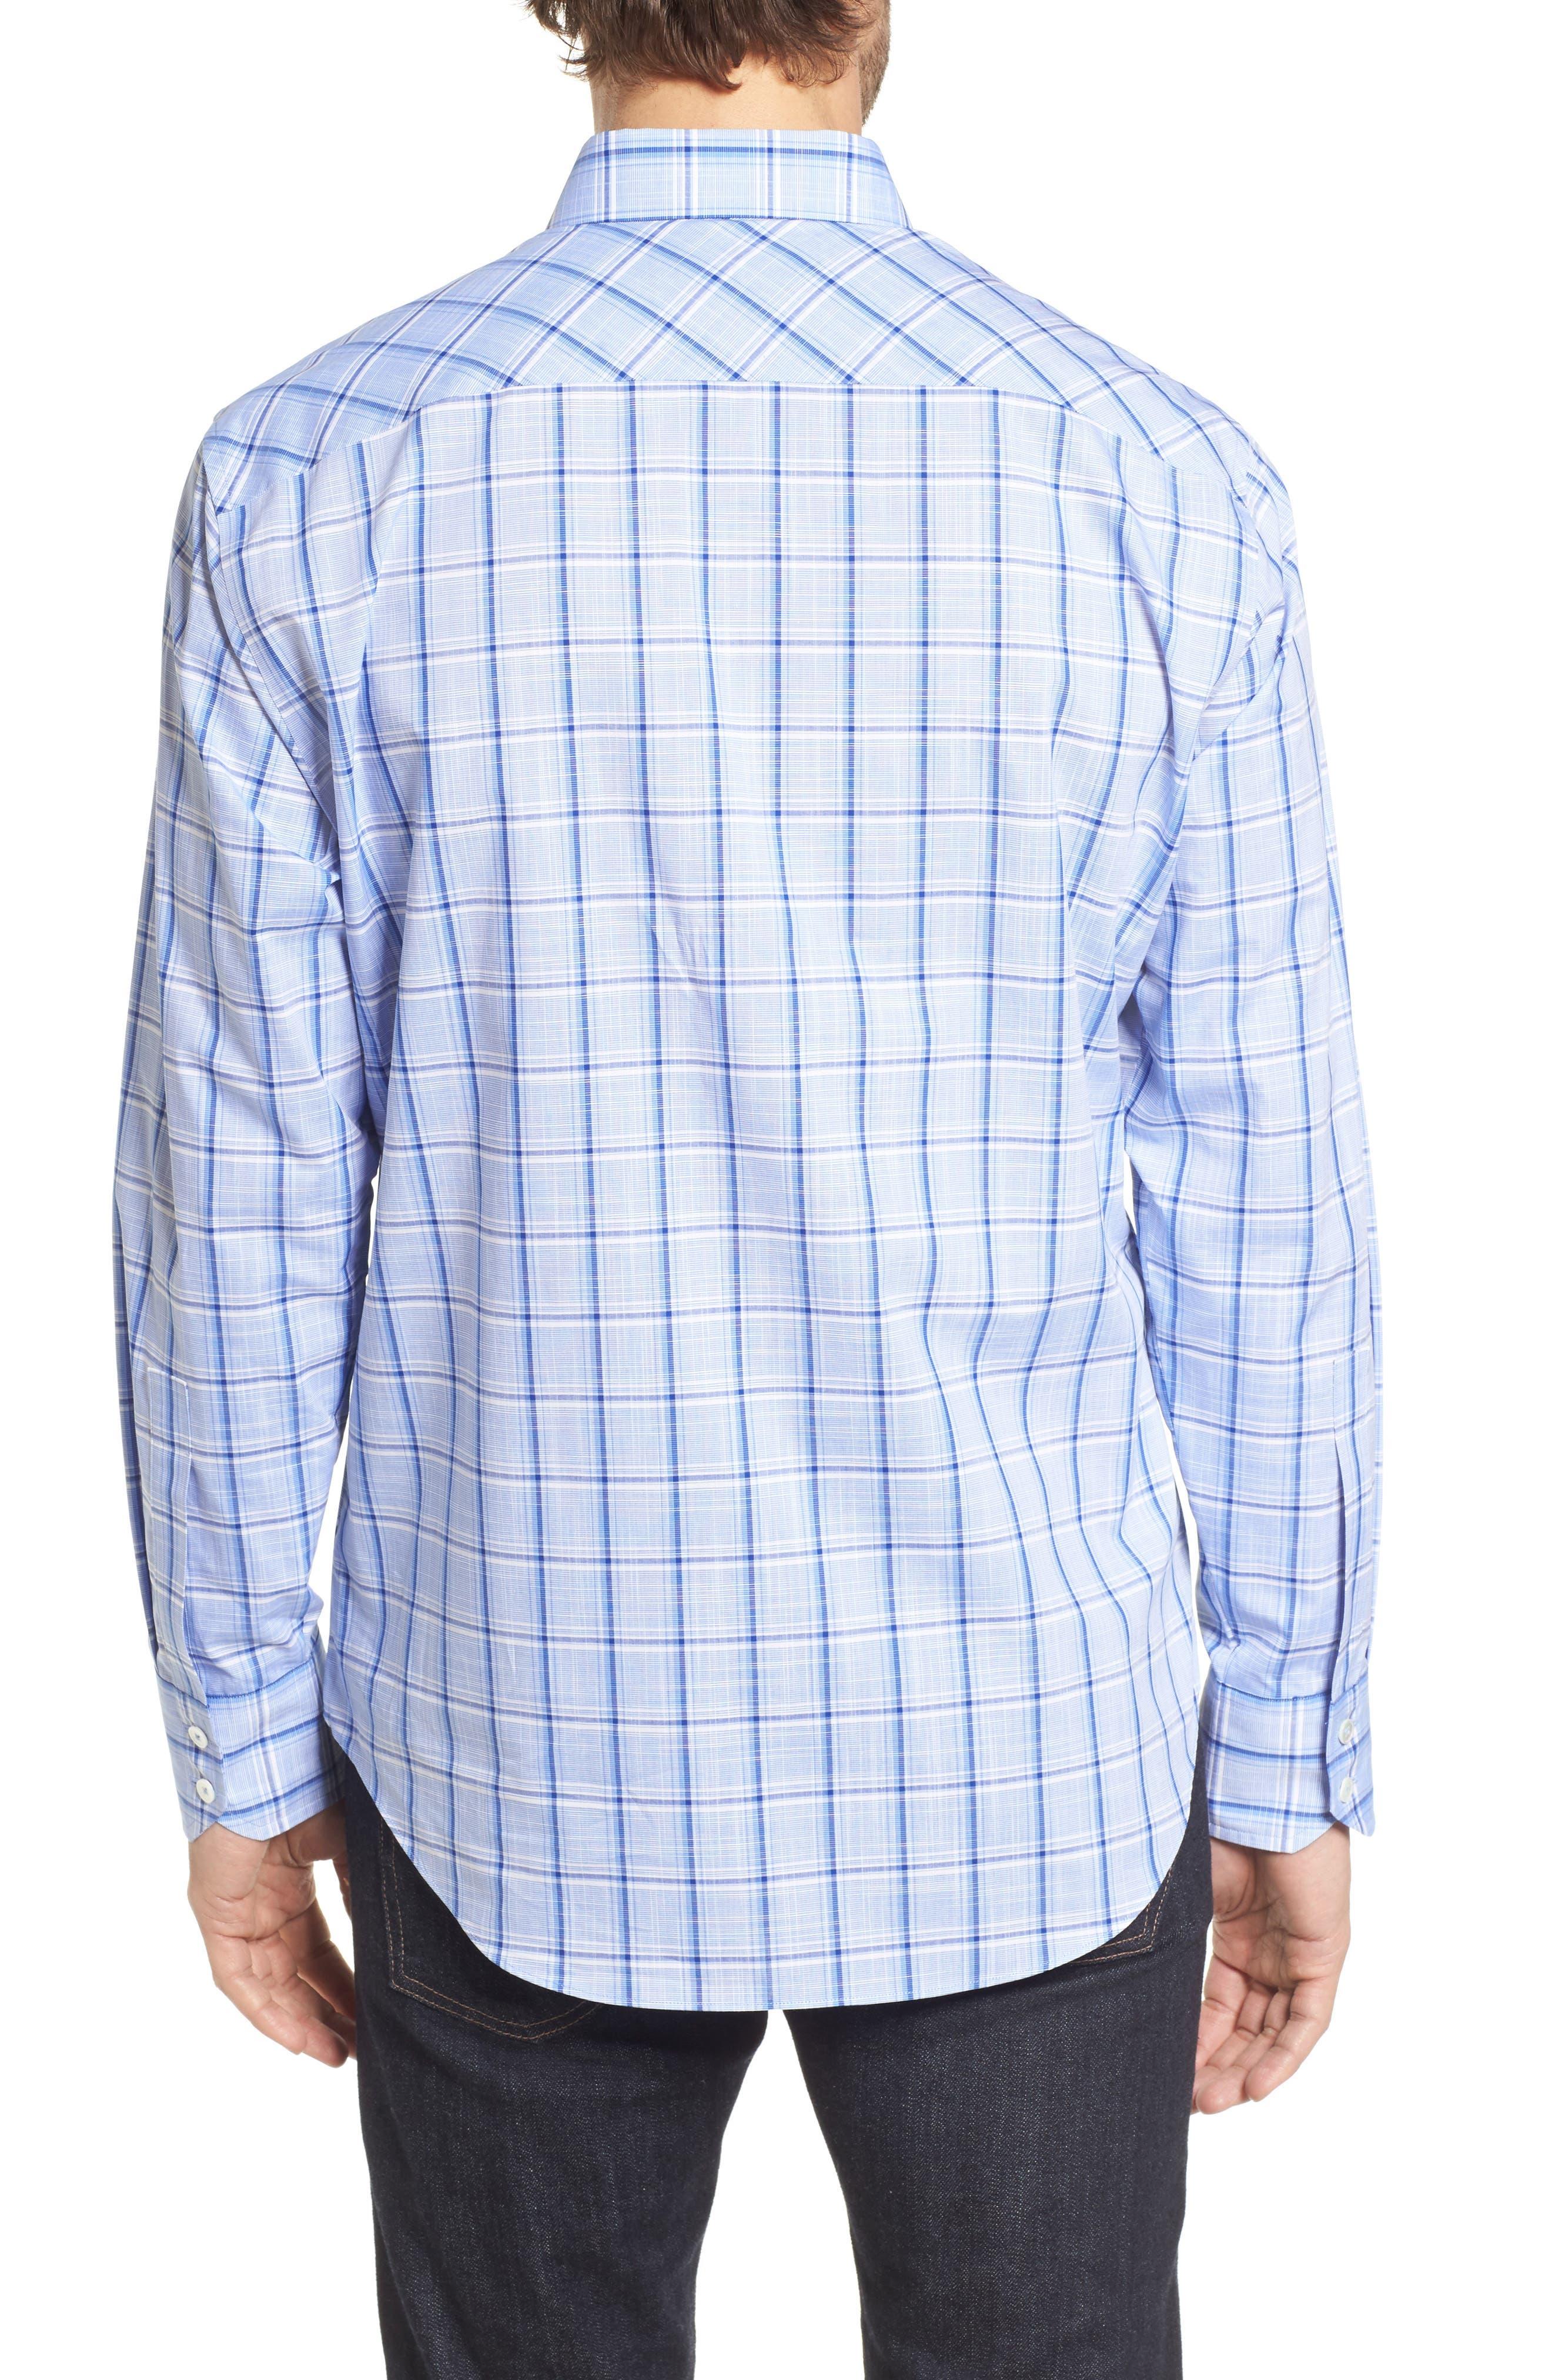 Alternate Image 2  - Zachary Prell Washington Plaid Sport Shirt